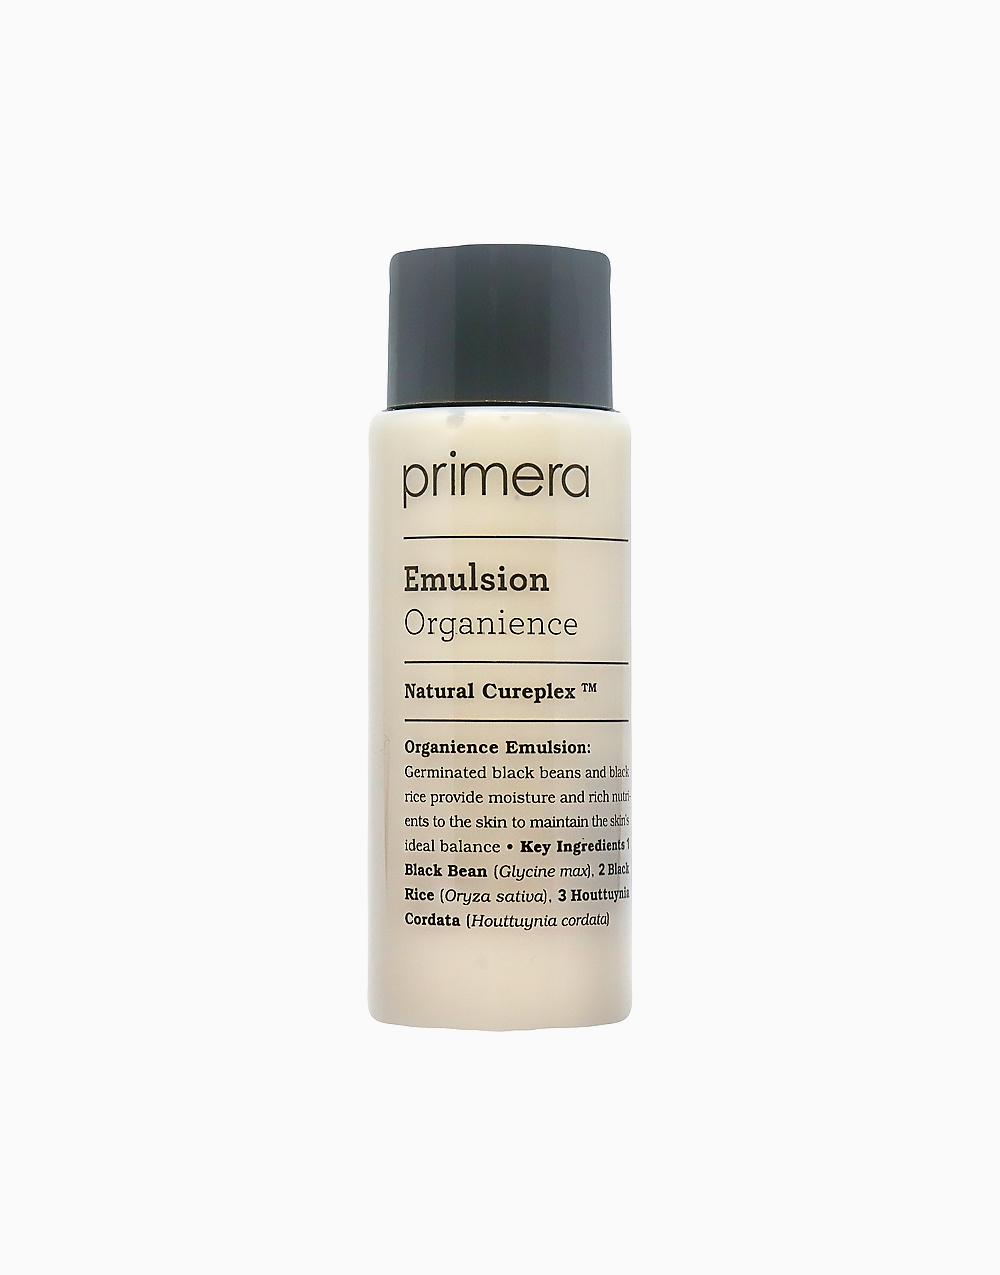 Organience Emulsion (50ml) by Primera